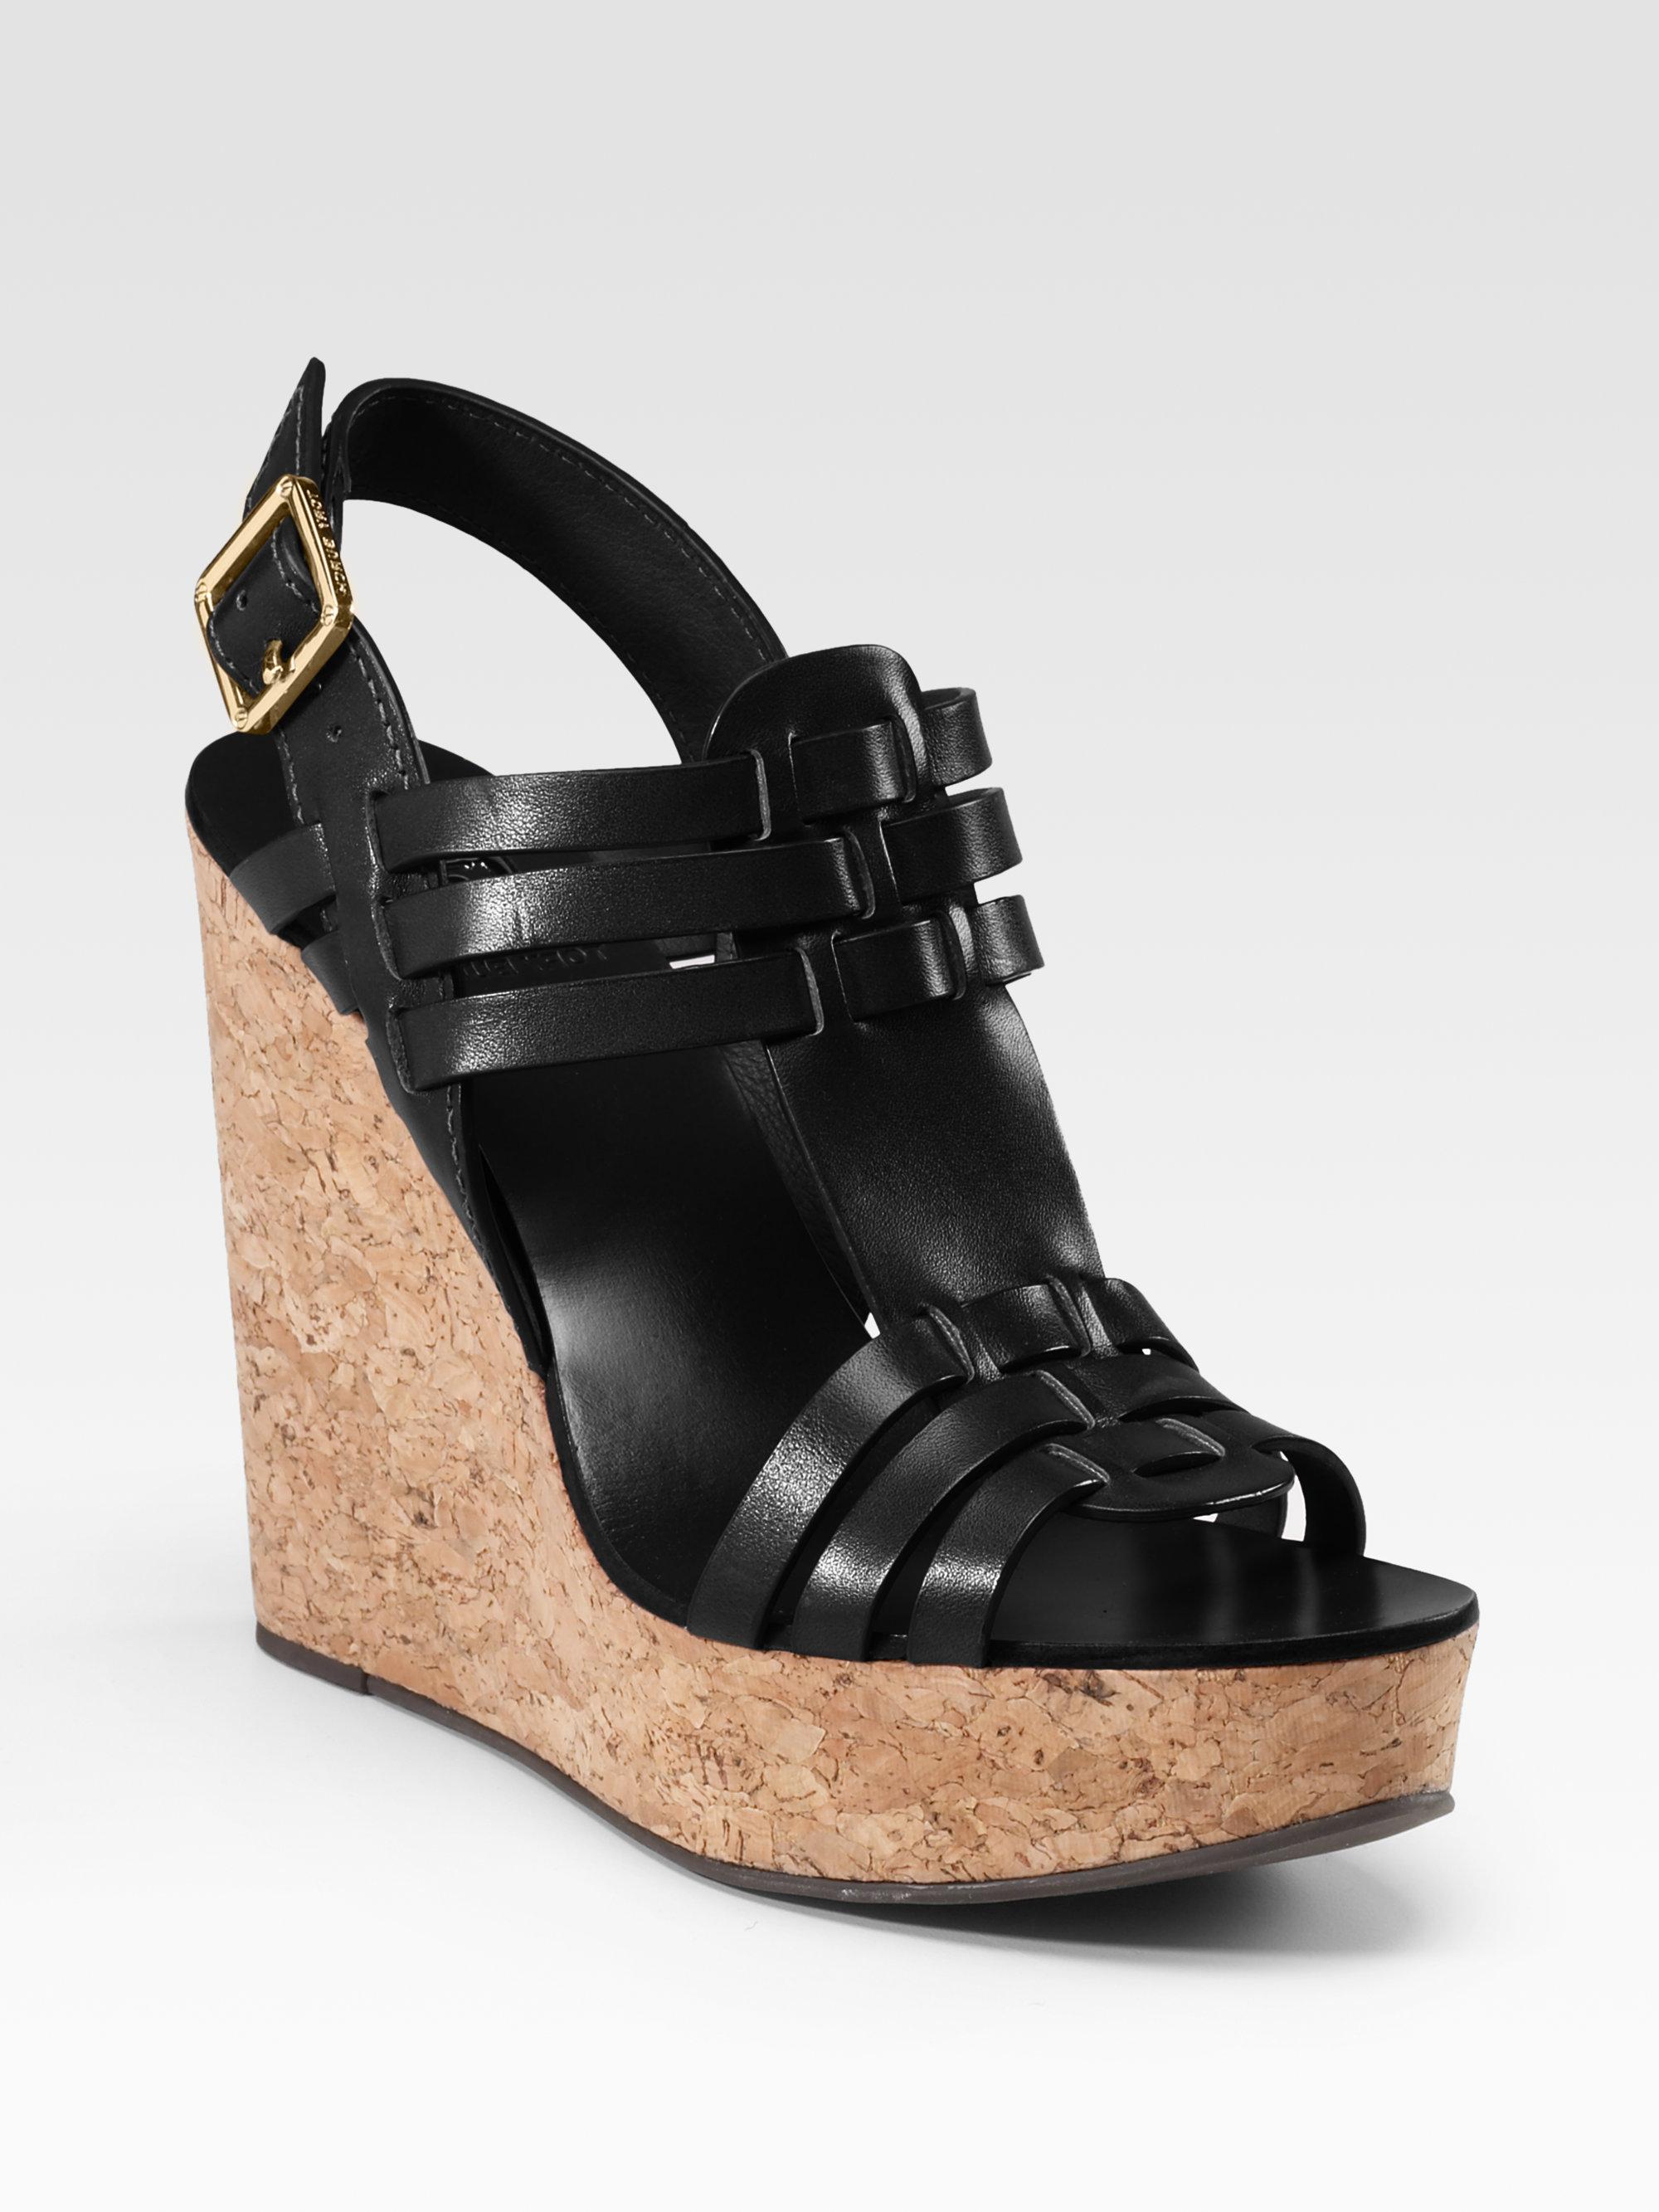 burch leslie cork wedge sandals in black lyst